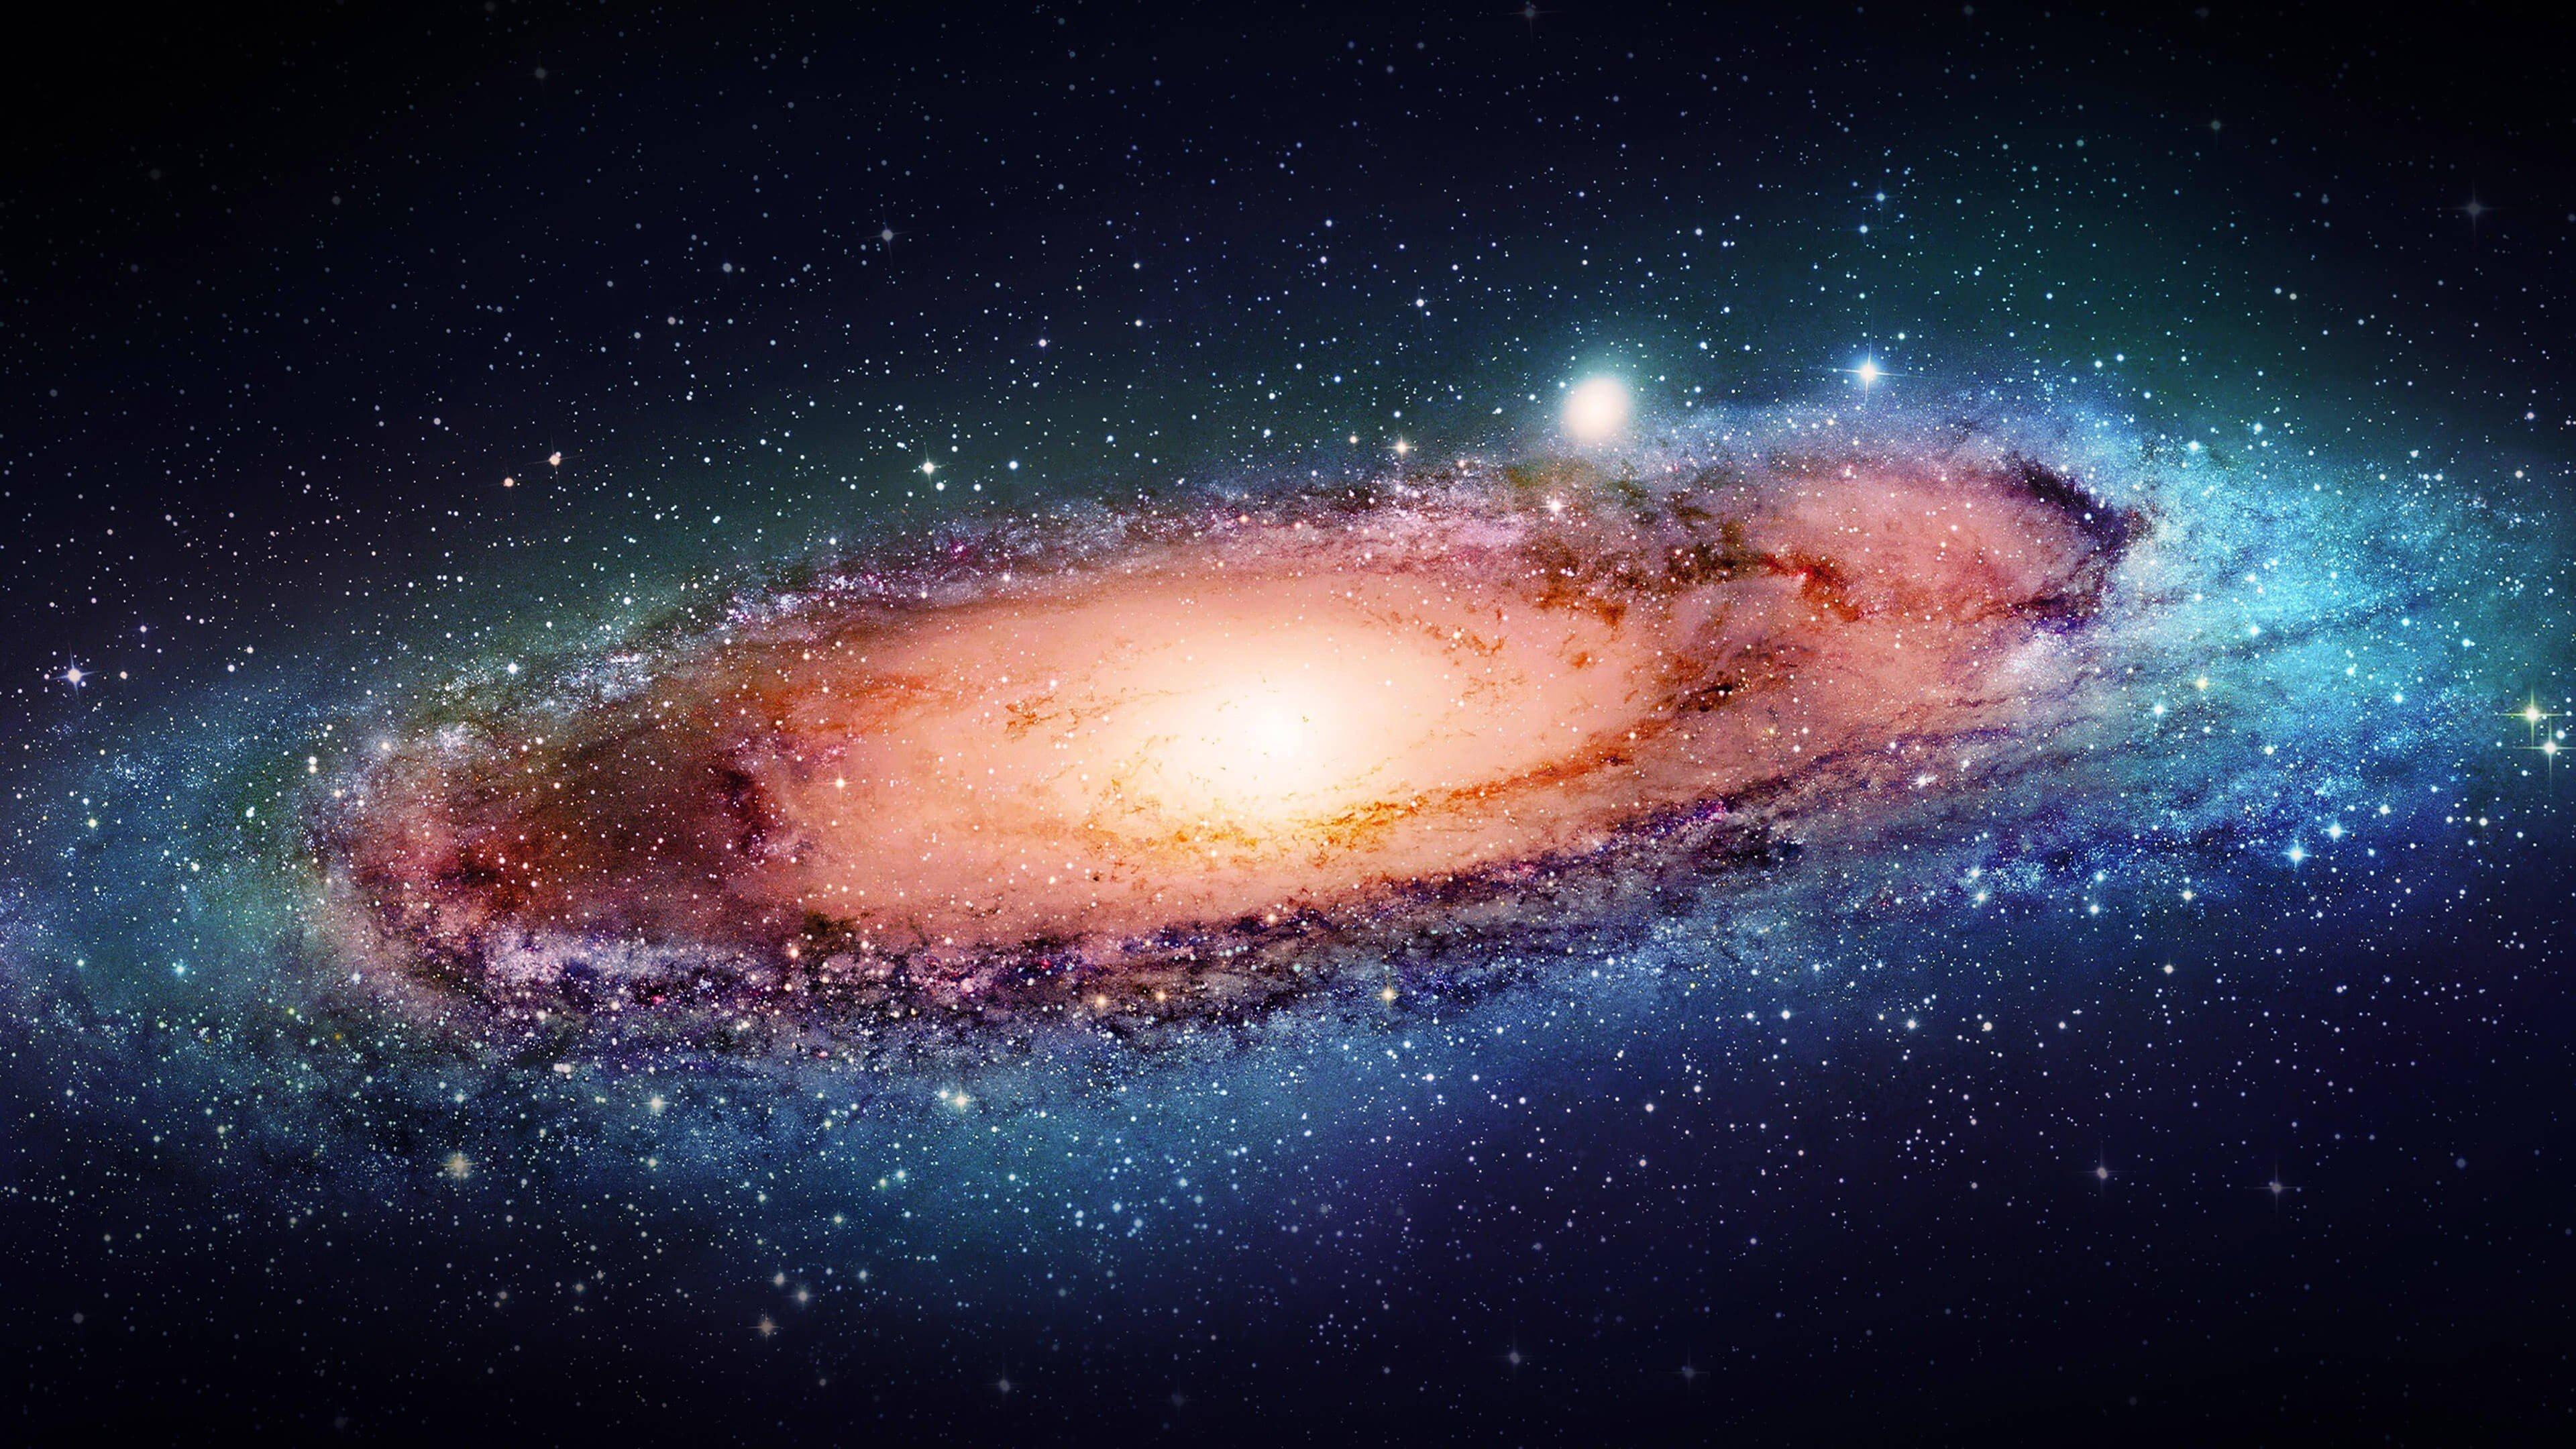 Milky Way HD wallpaper for 4K 3840 x 2160   HDwallpapersnet 3840x2160